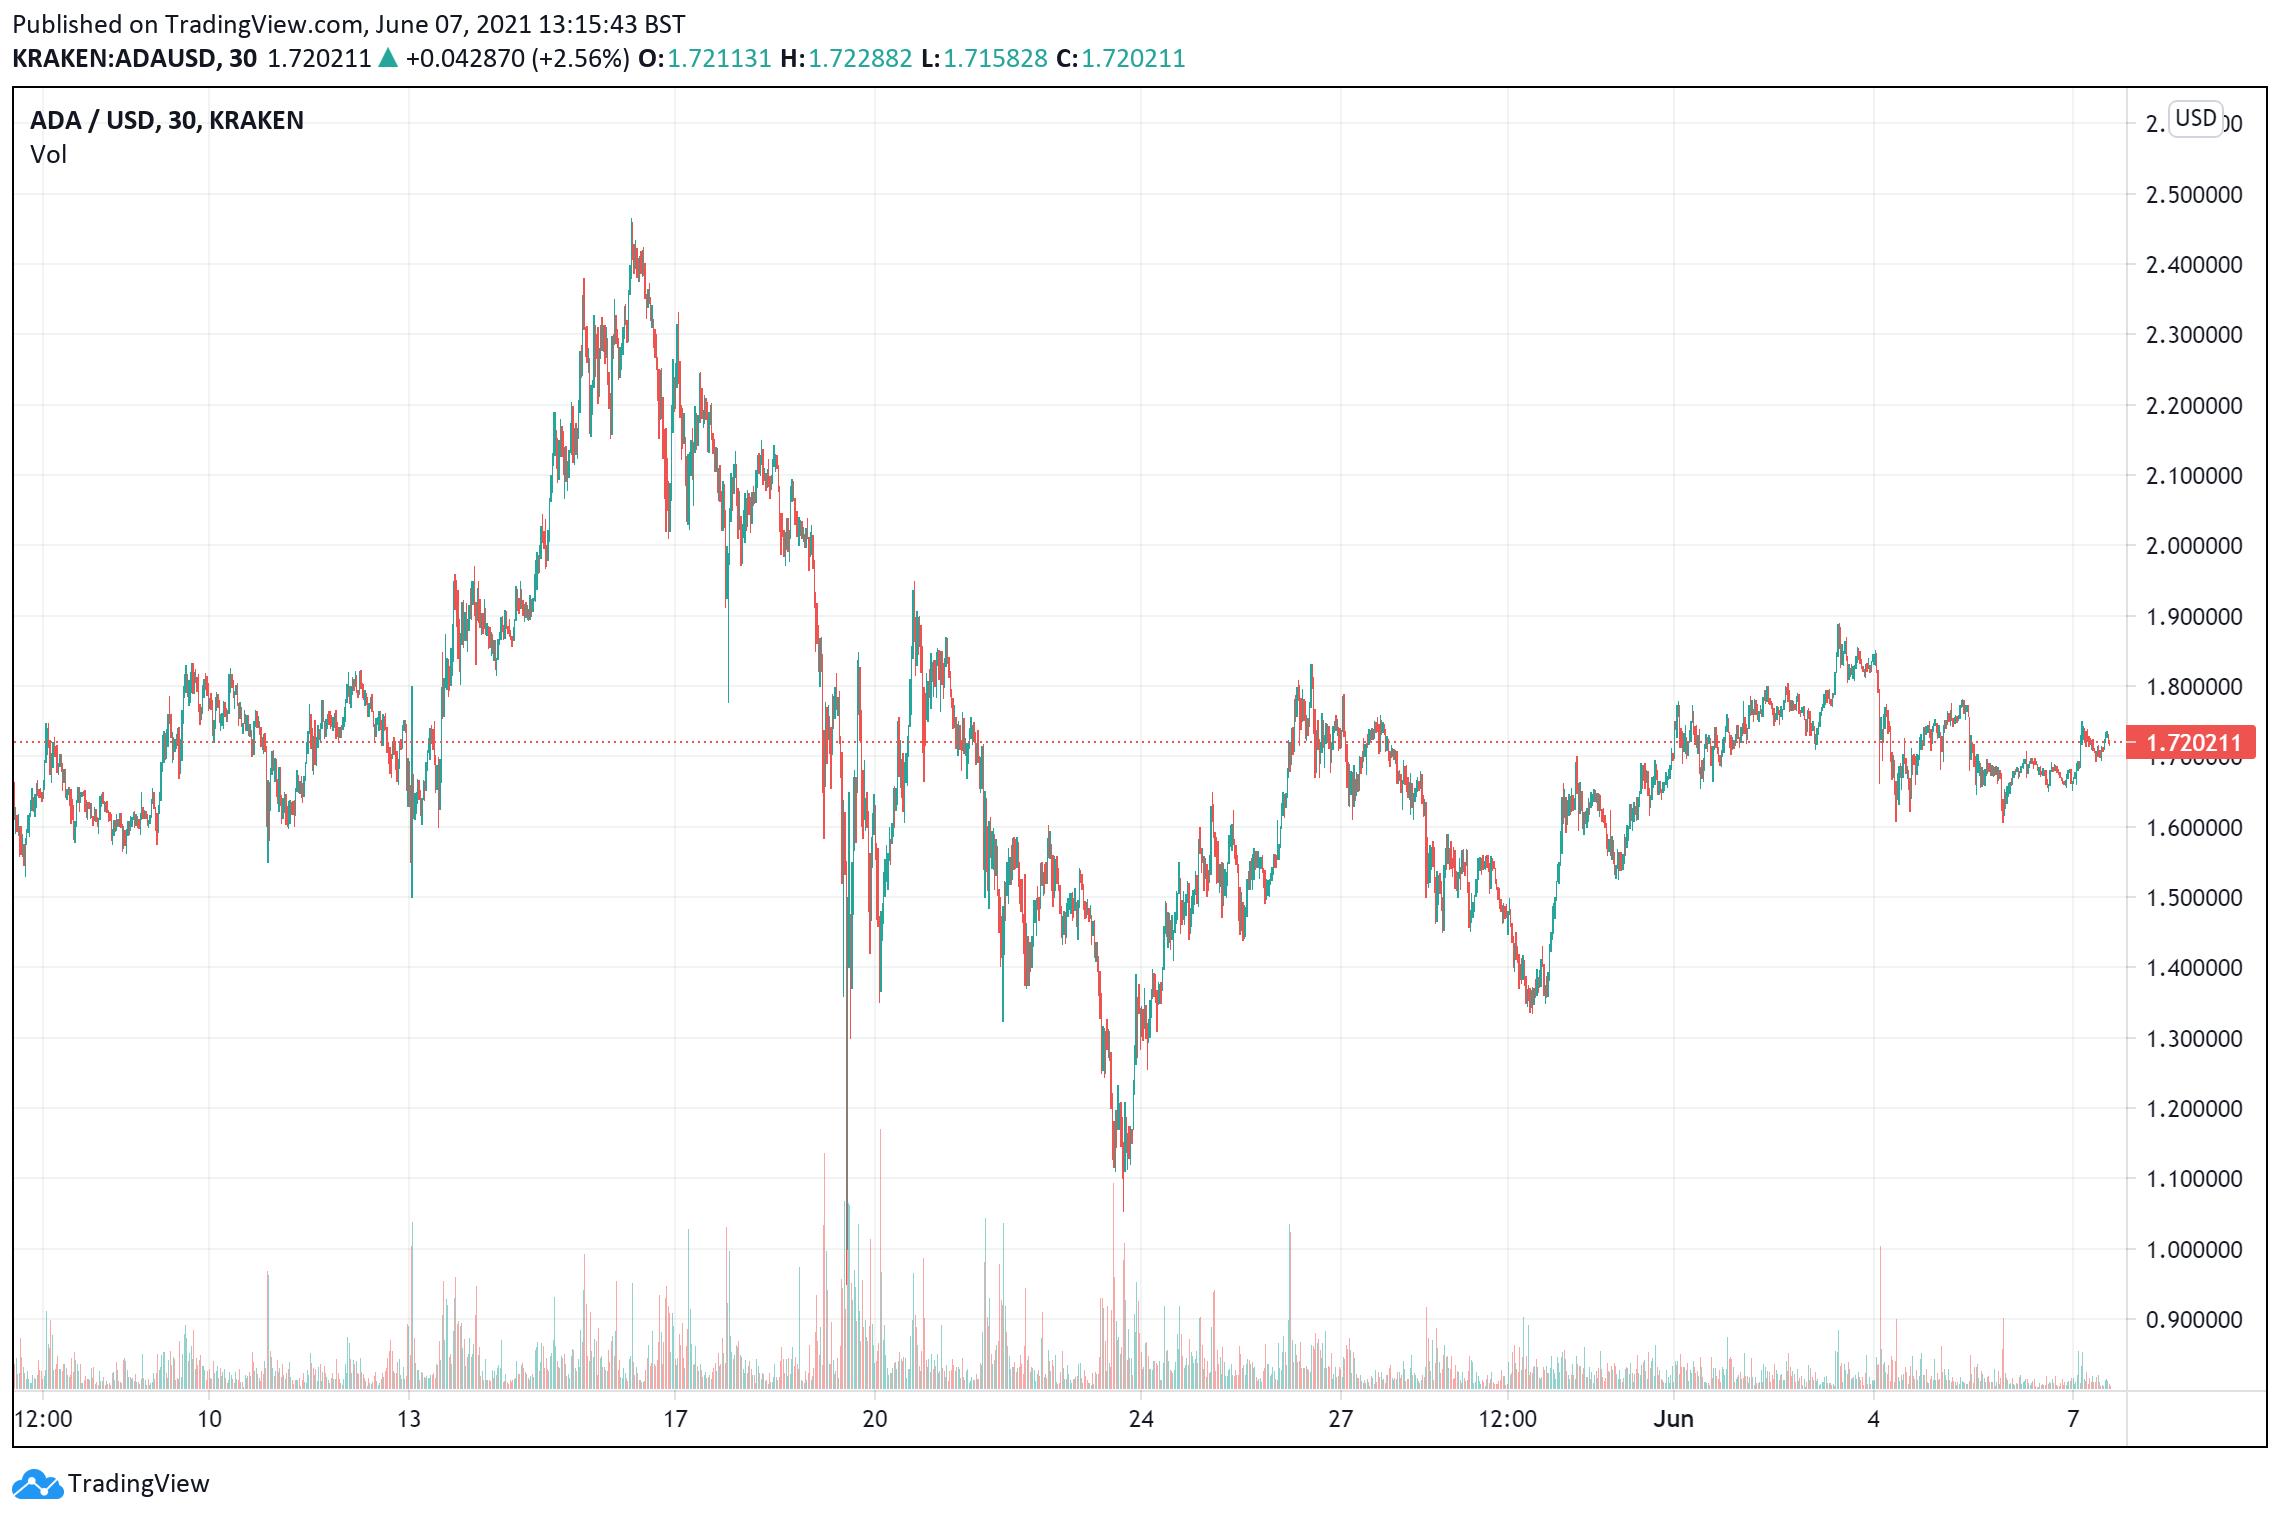 ADA June 7 price chart